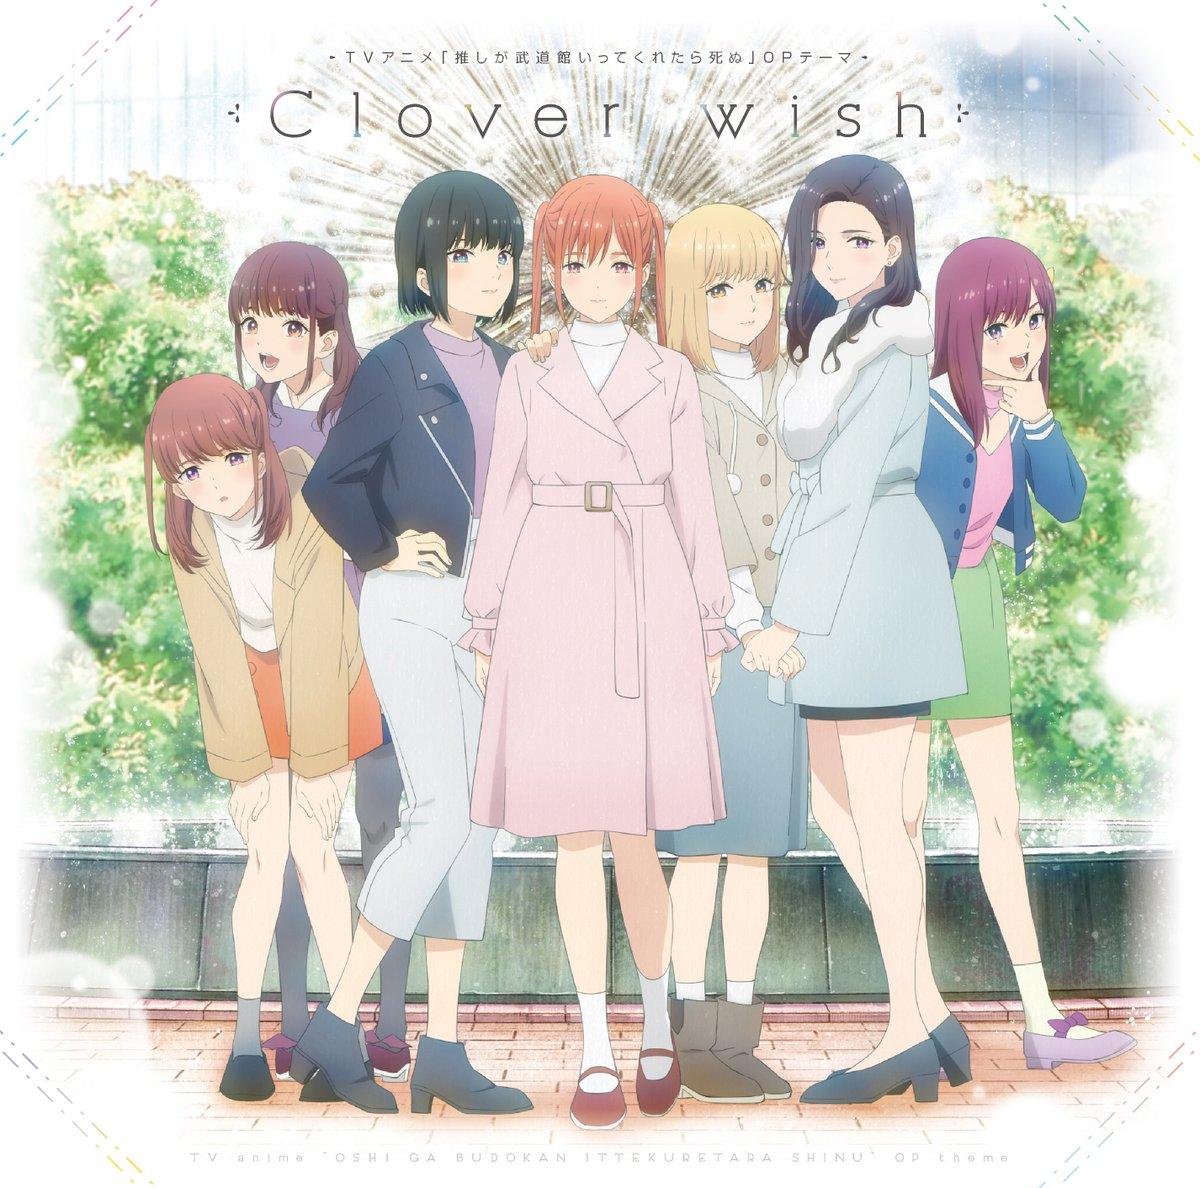 『ChamJam - Clover wish』収録の『Clover wish』ジャケット